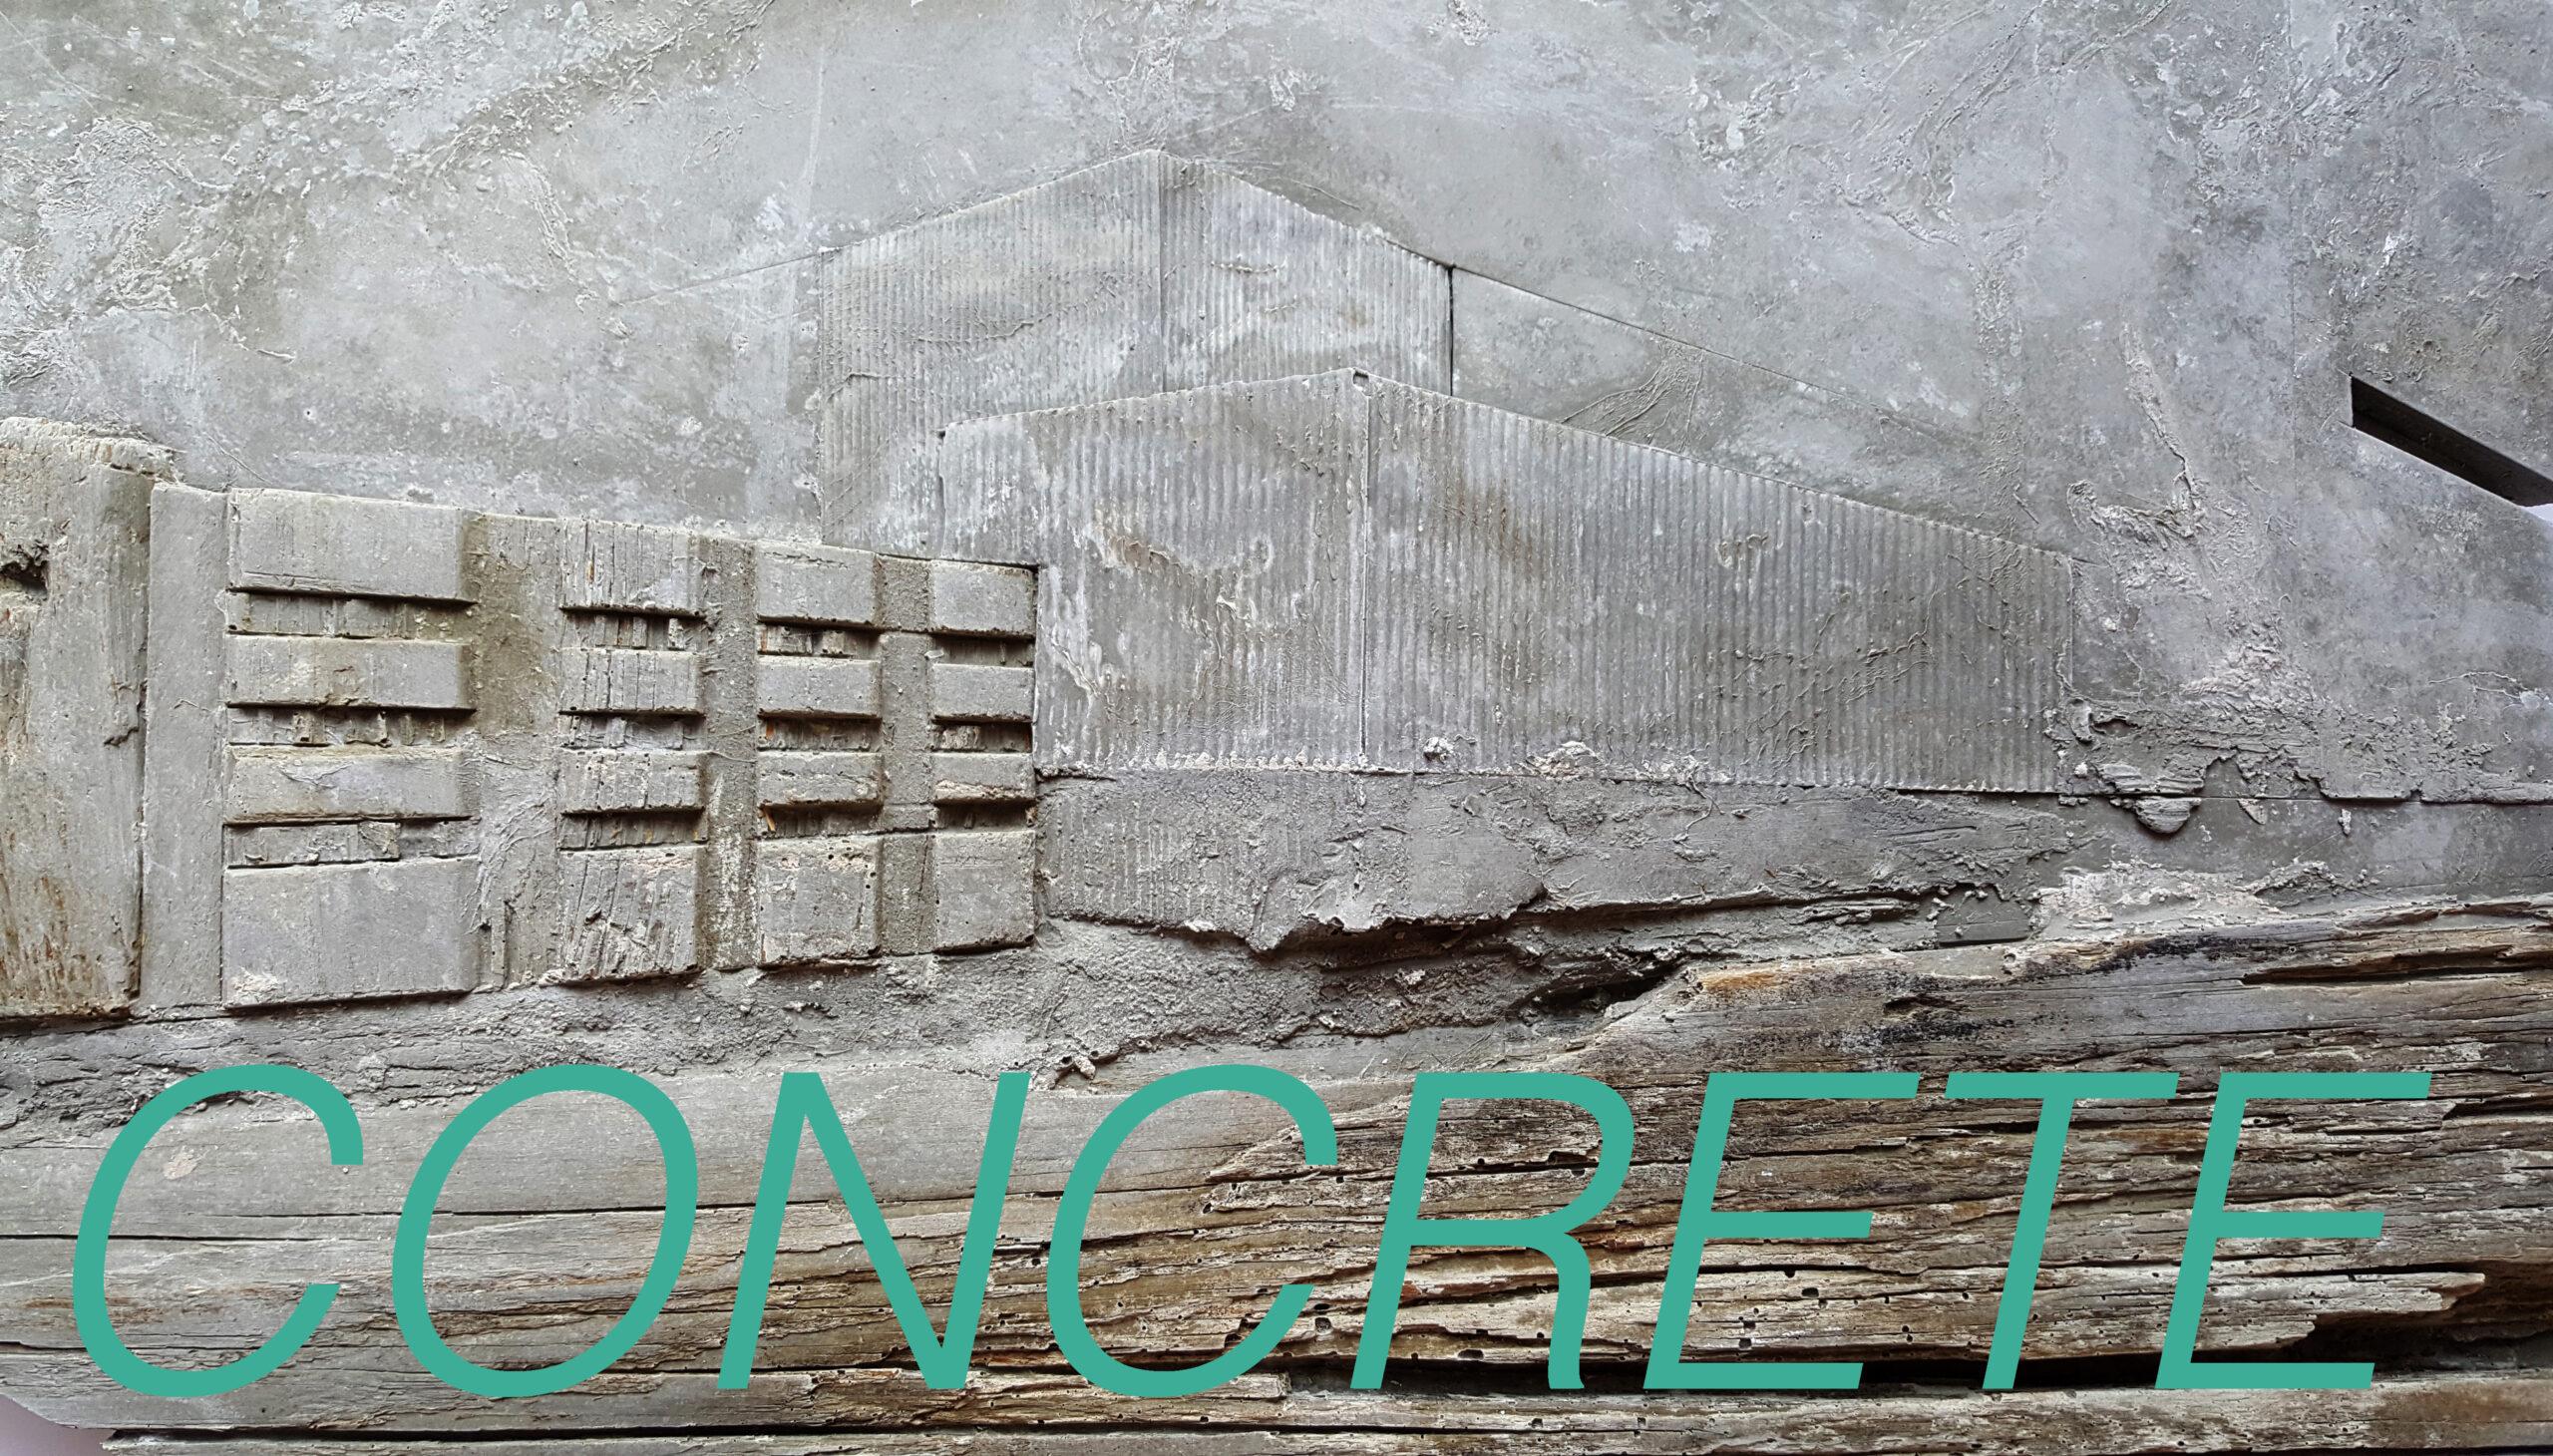 Concrete_hamburger_kunstprojekt